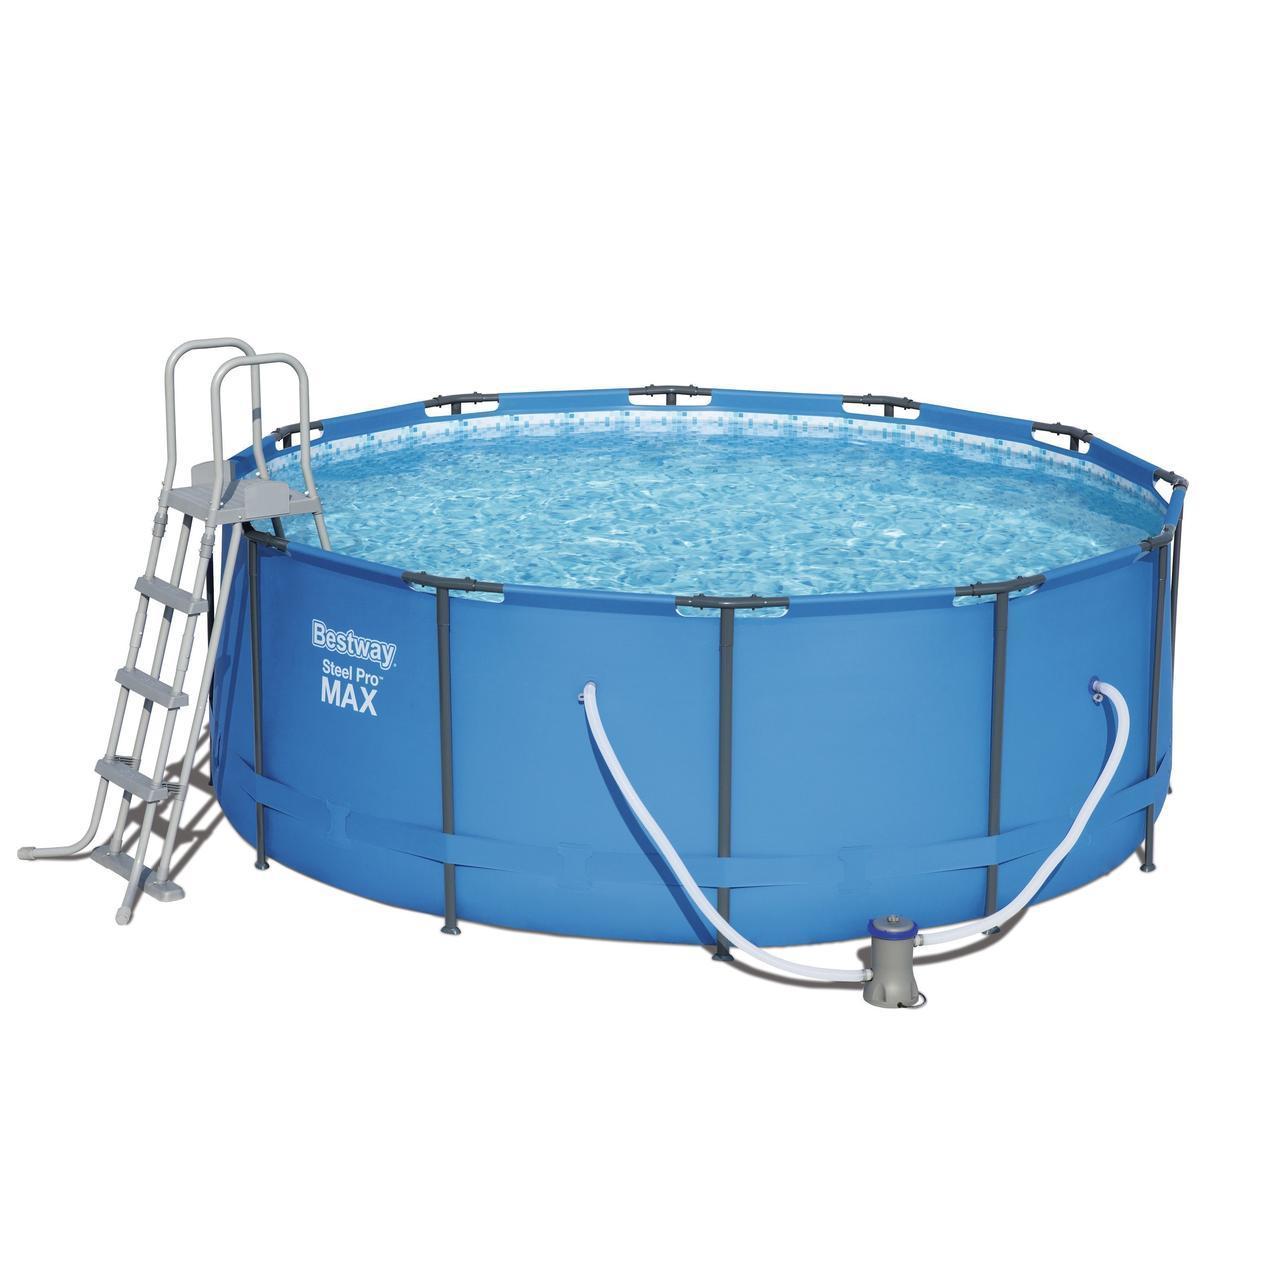 Каркасный бассейн MAX Bestway 56420 - 0, 366 х 122 см